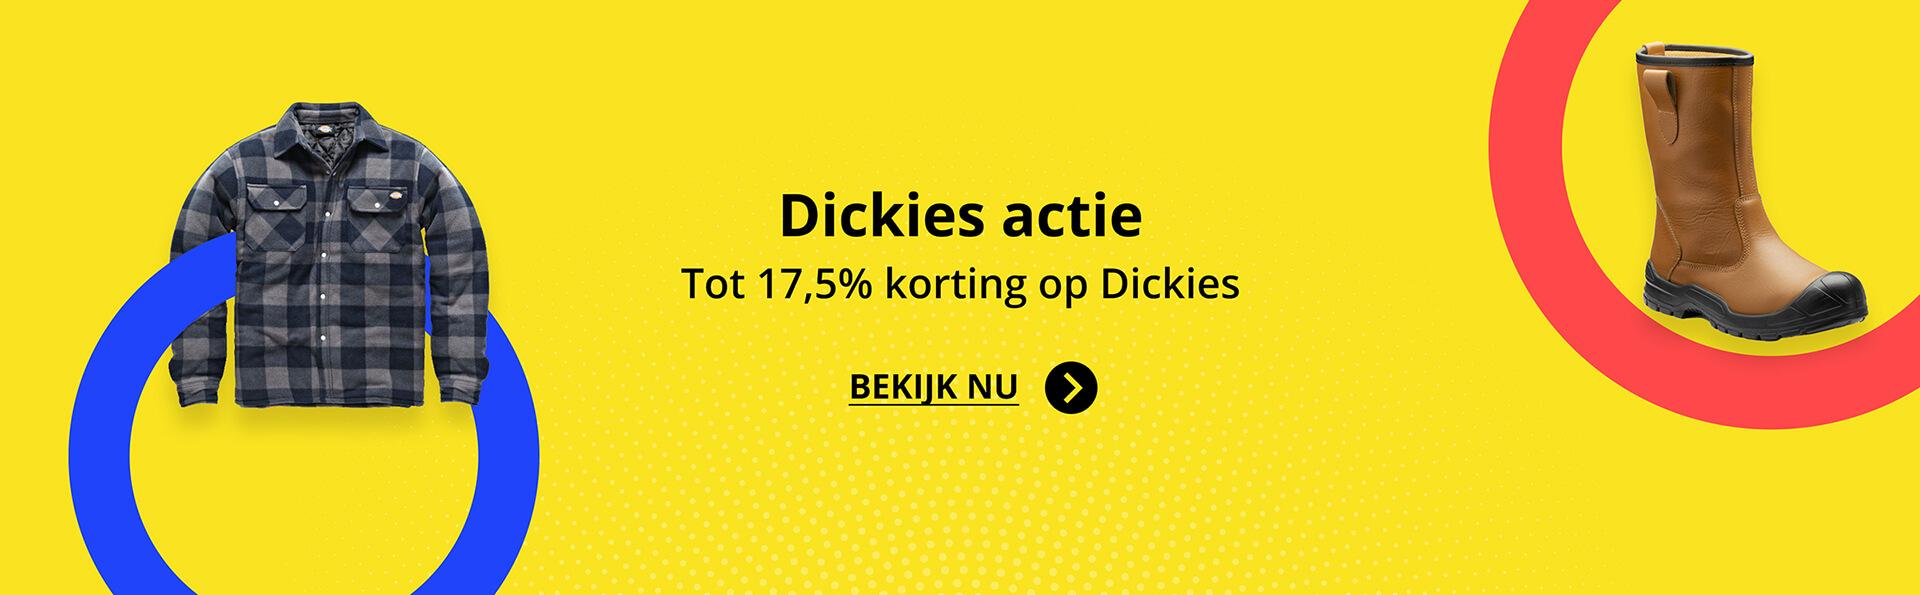 20190916 - Dickies Korting comp.